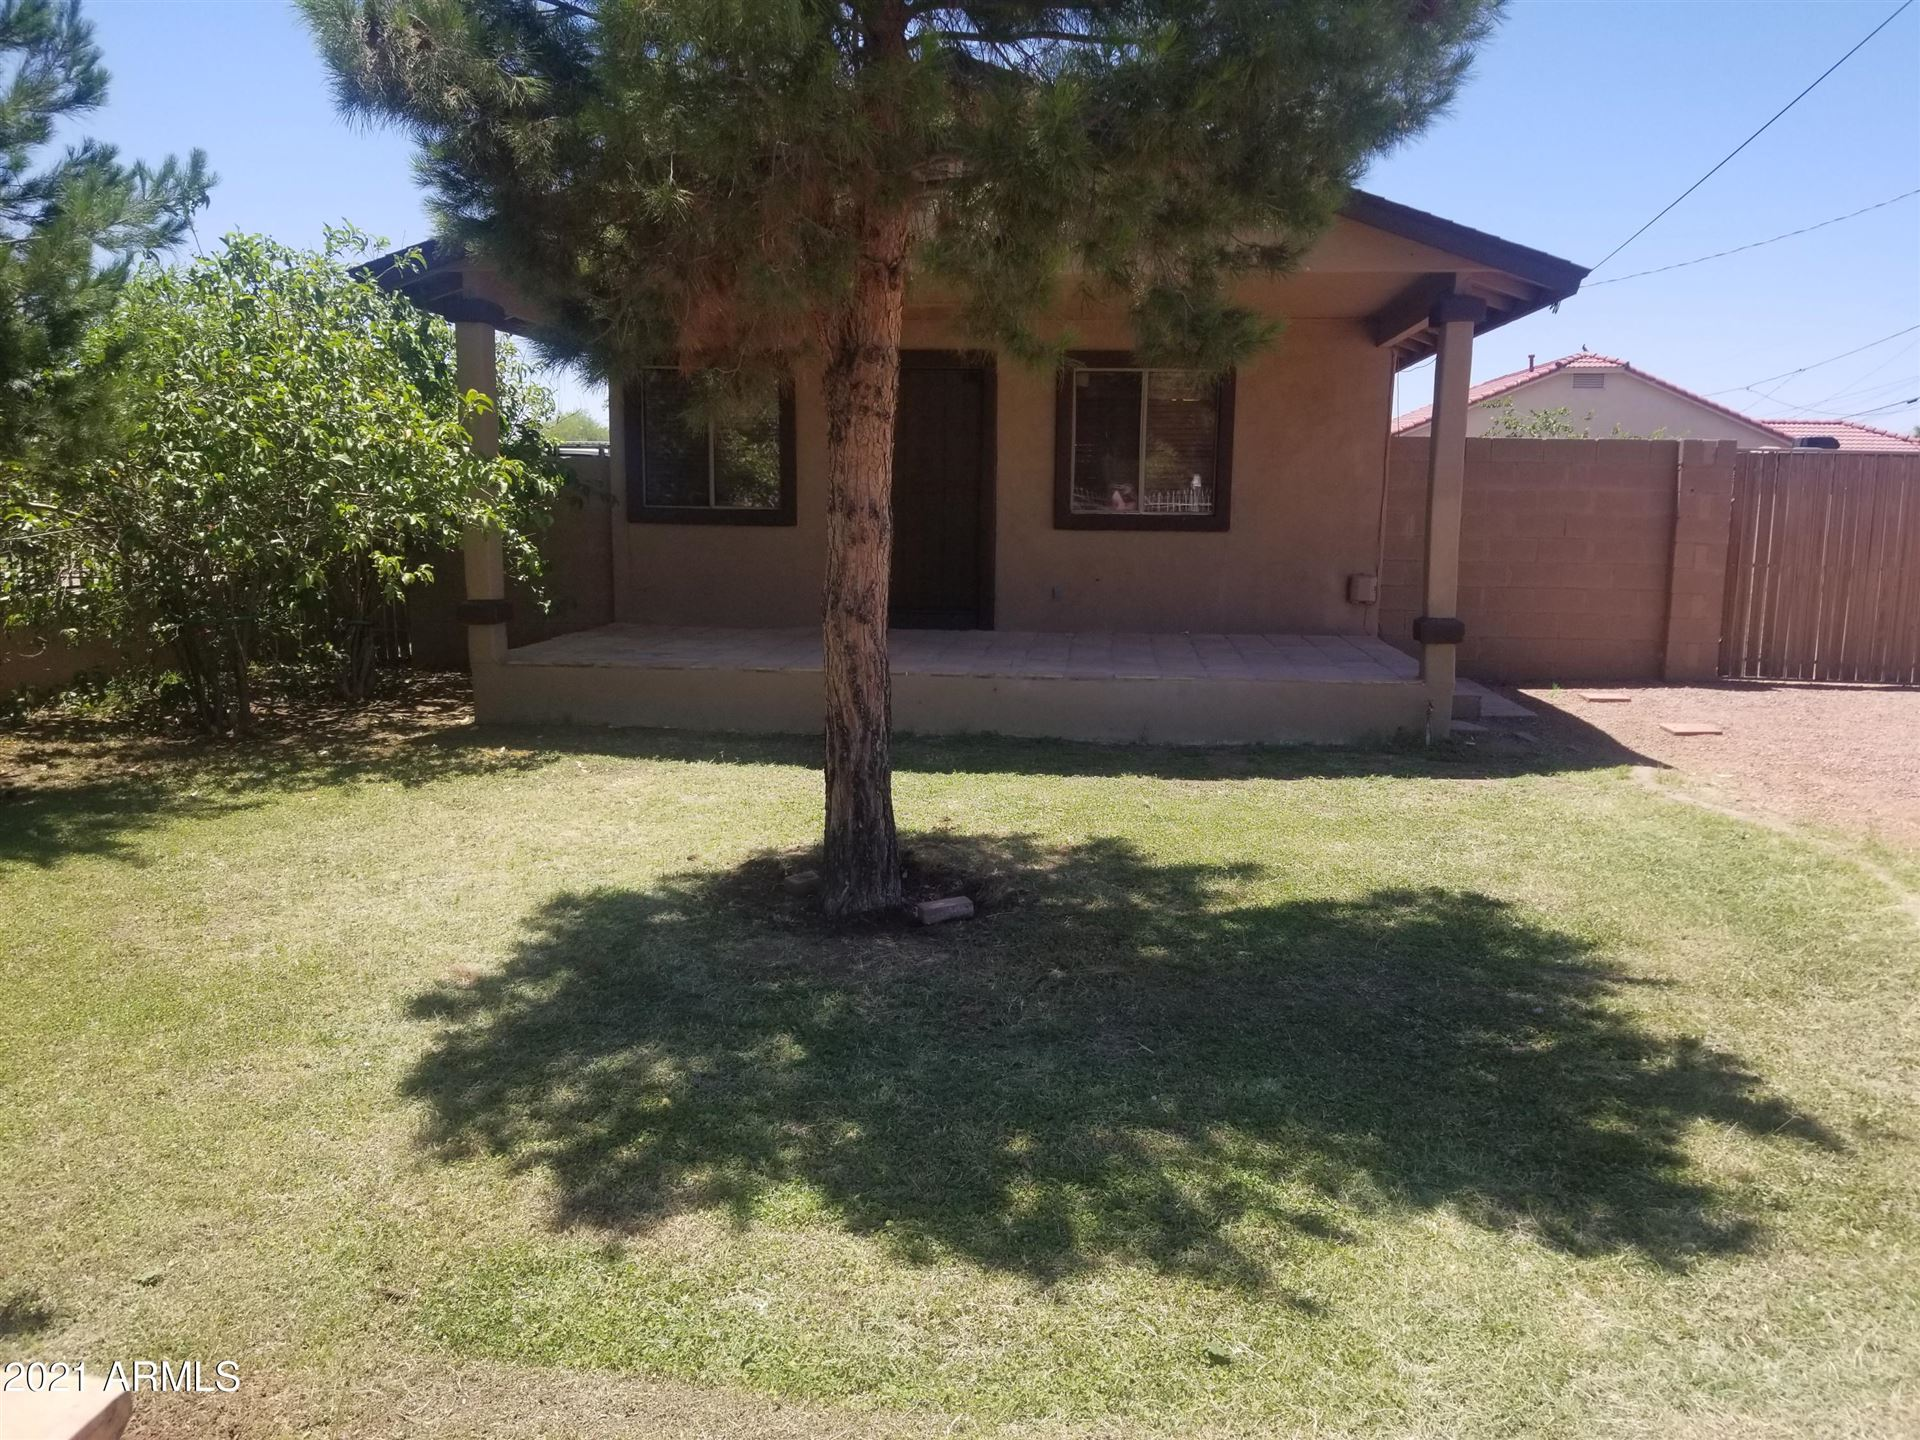 Photo of 11610 N 81st Avenue, Peoria, AZ 85345 (MLS # 6249877)